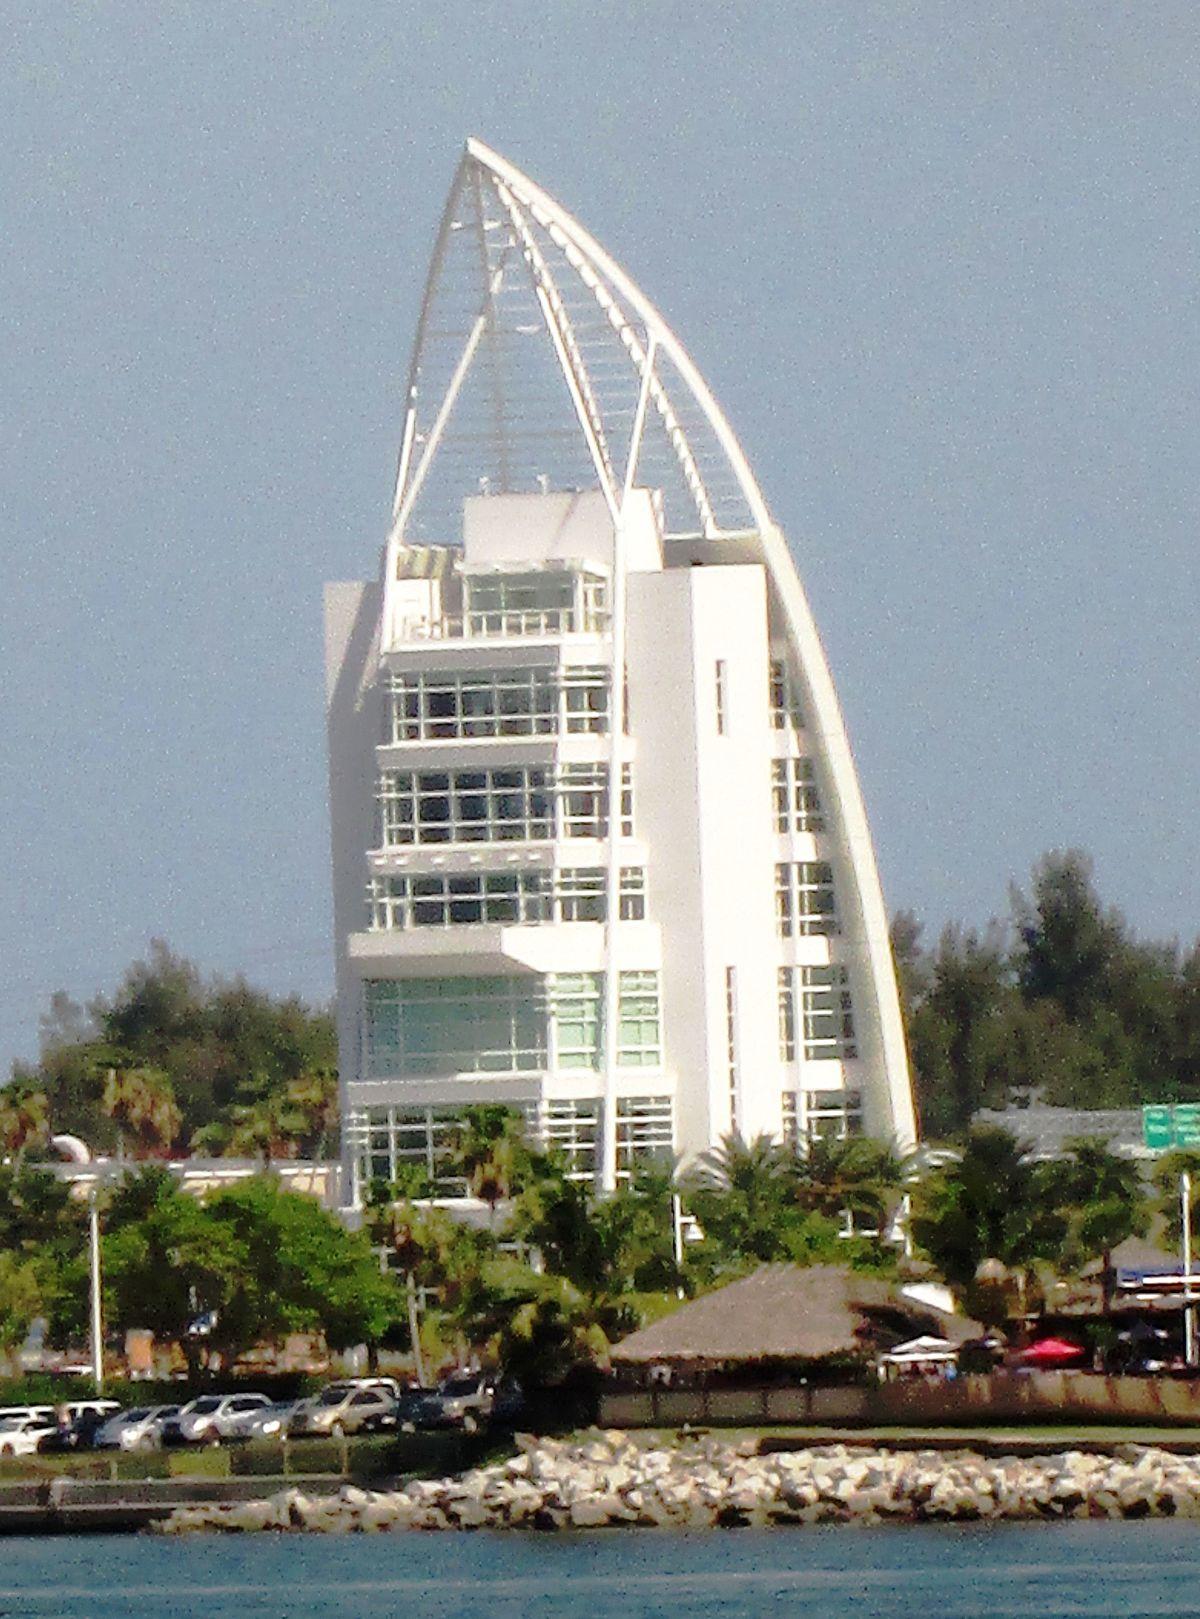 21 casino florida ocean petersburg royale ship st tampa yamashiro south florida casinos